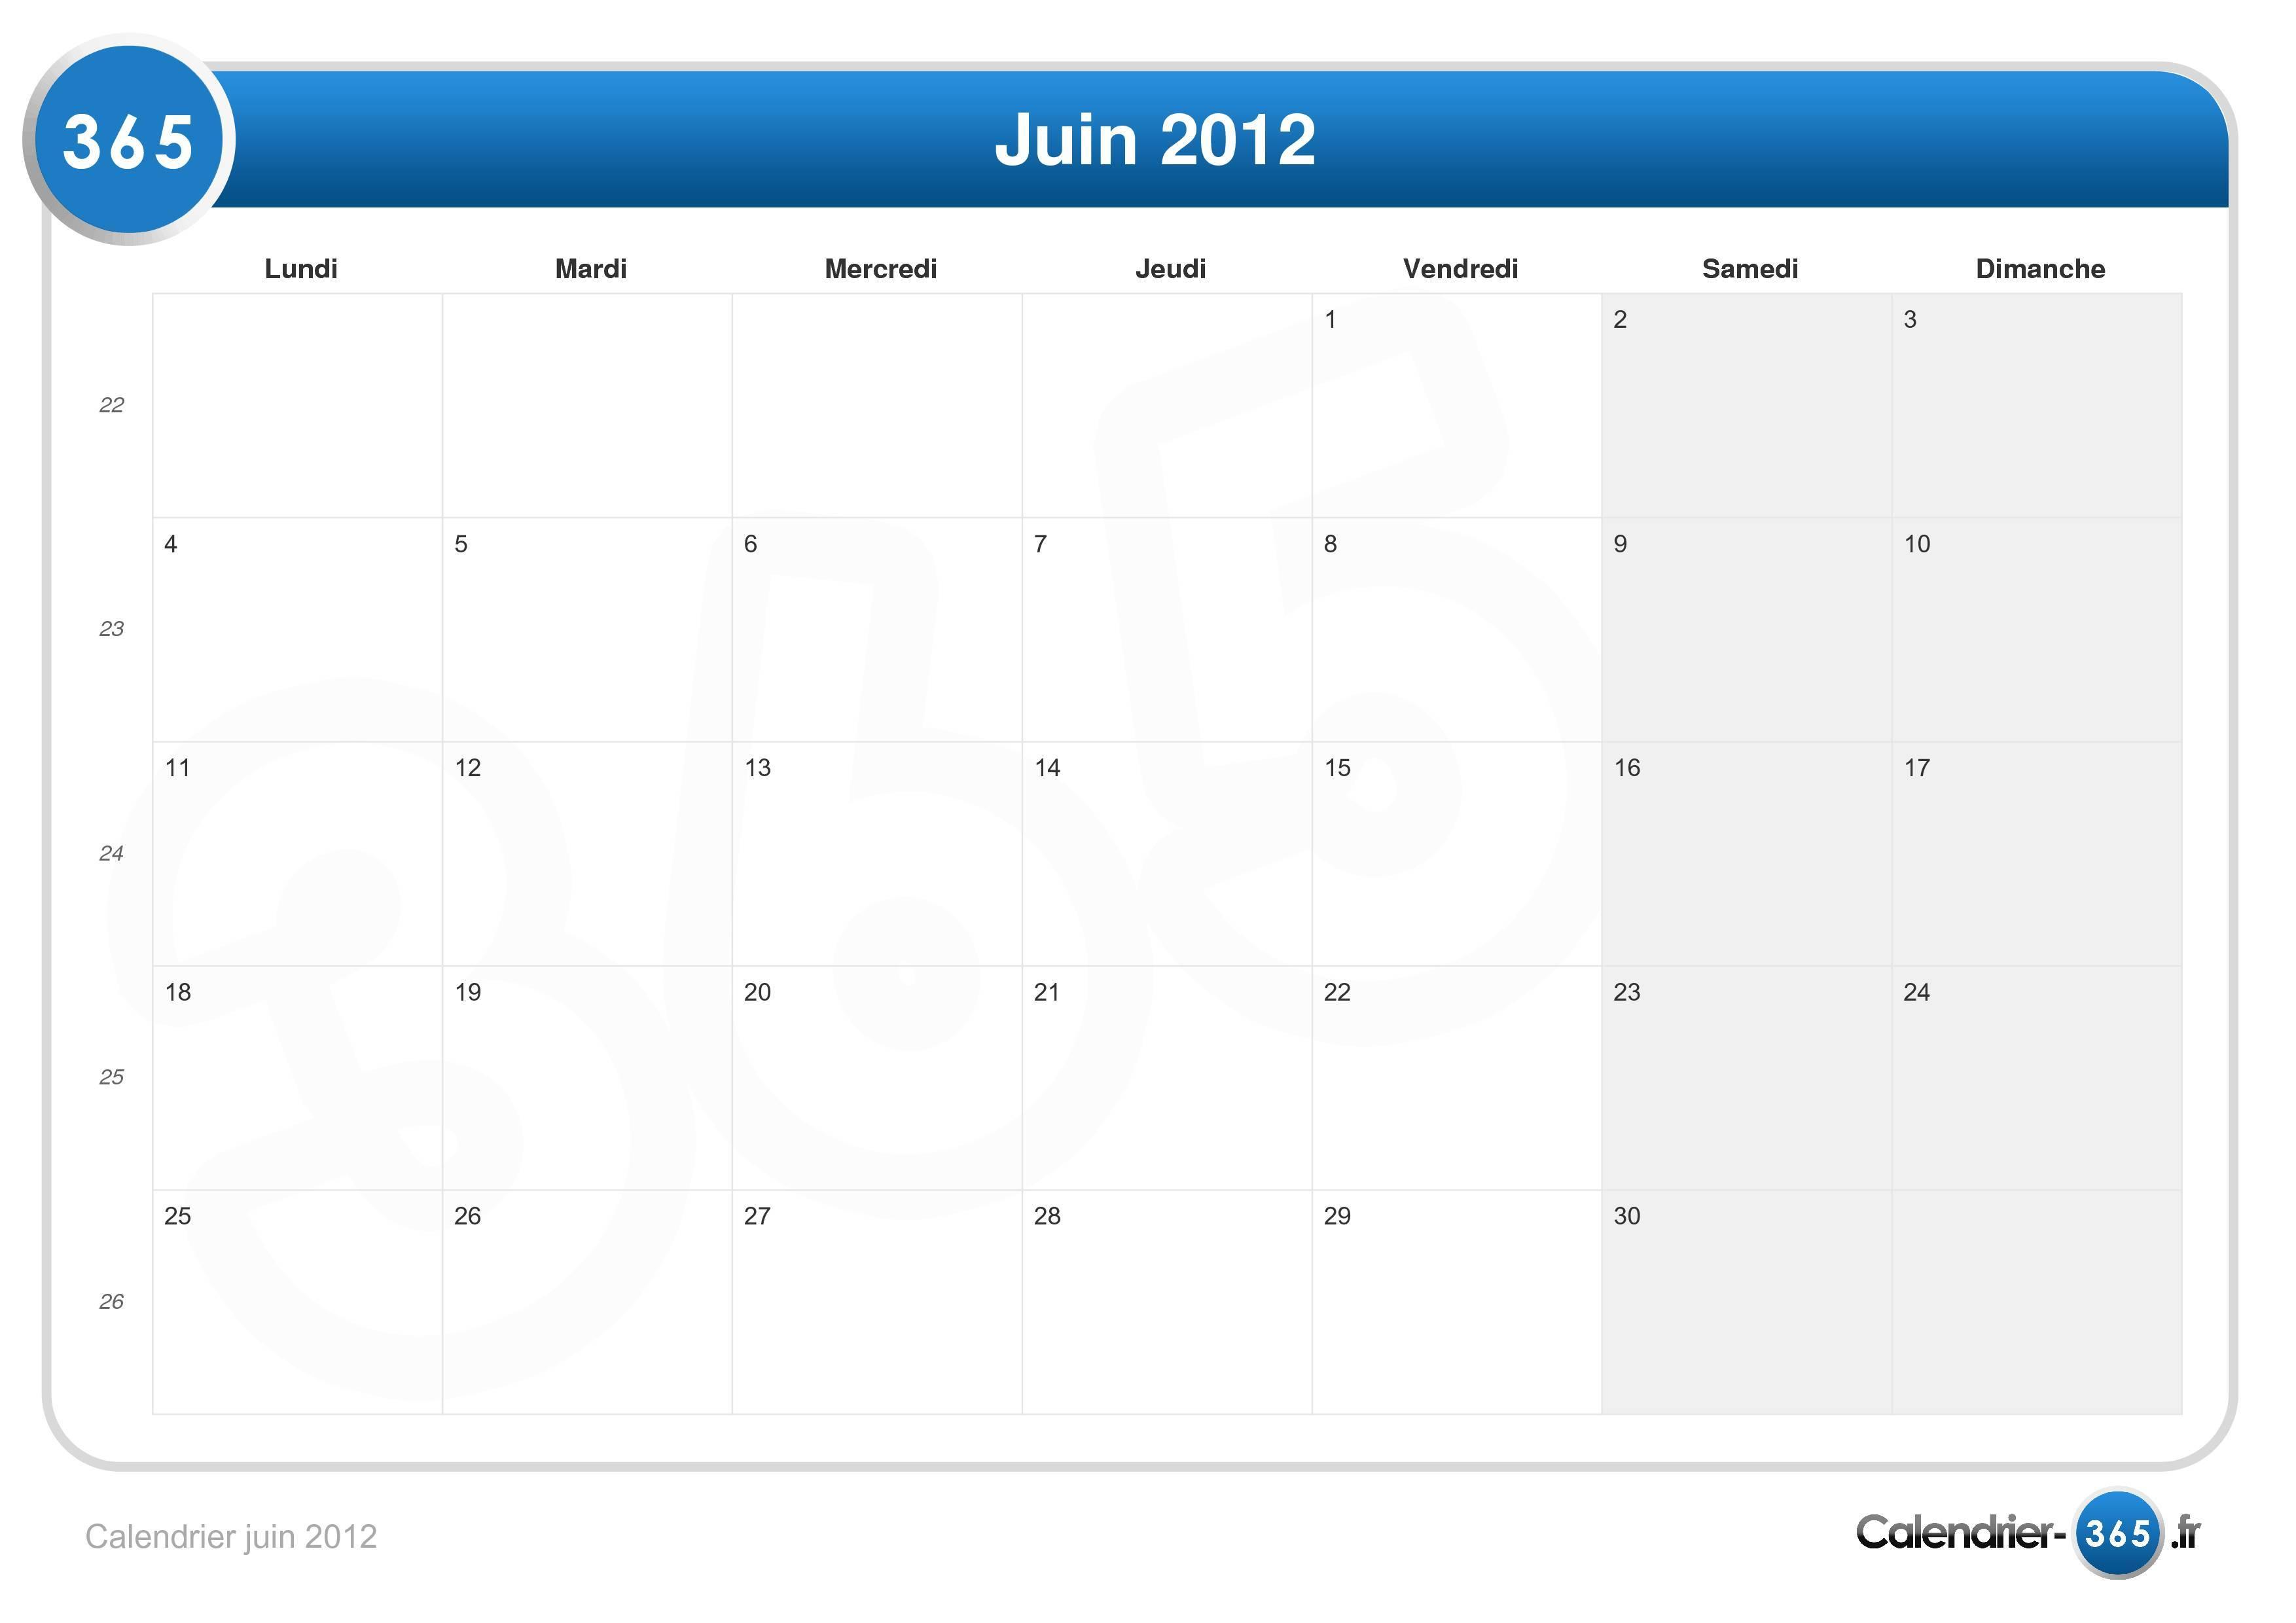 Calendrier Juin 2012